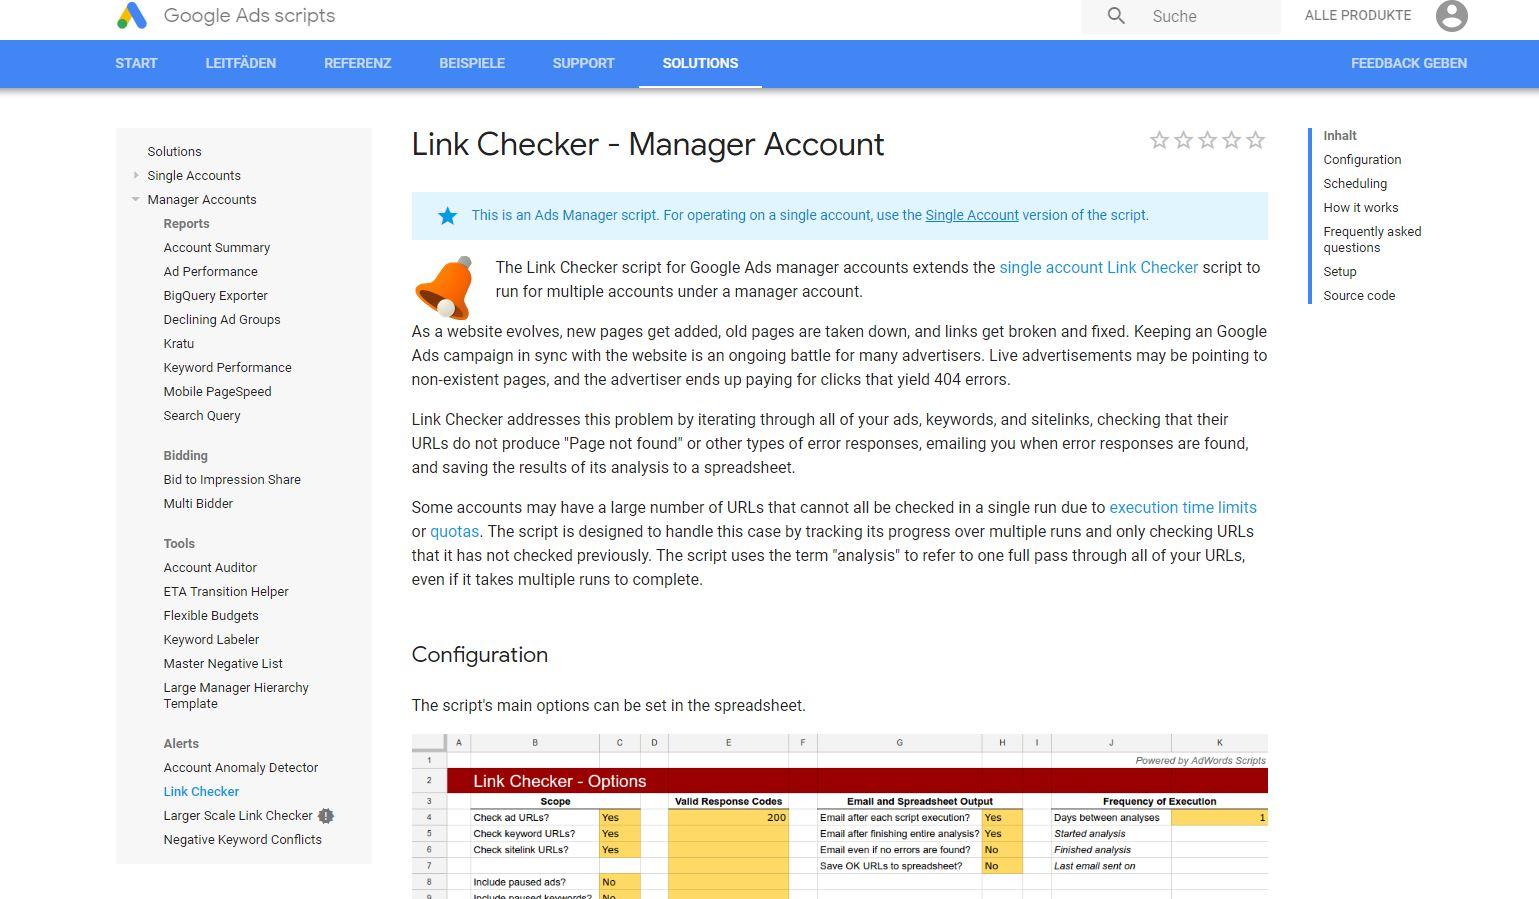 Link Checker Skript für Manager Accounts